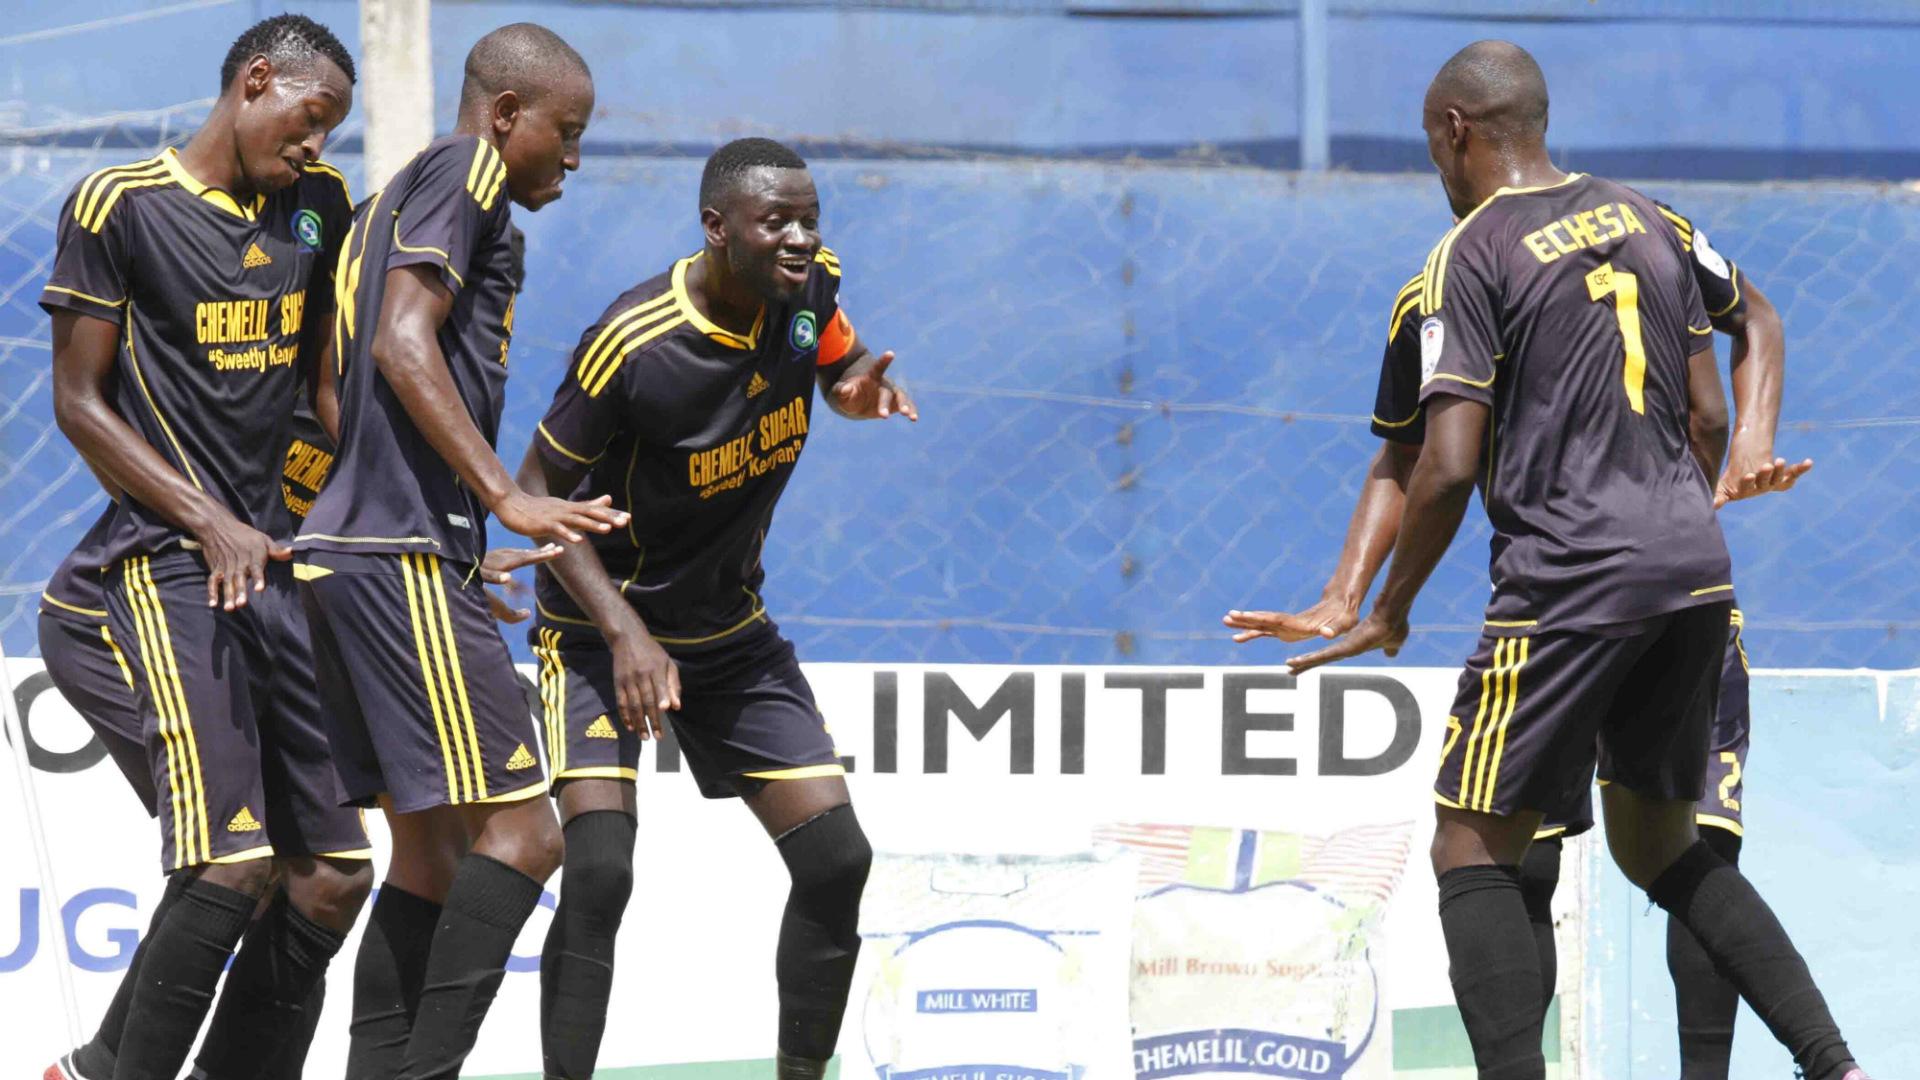 Uk epl fixtures kenyan epl sunday match results